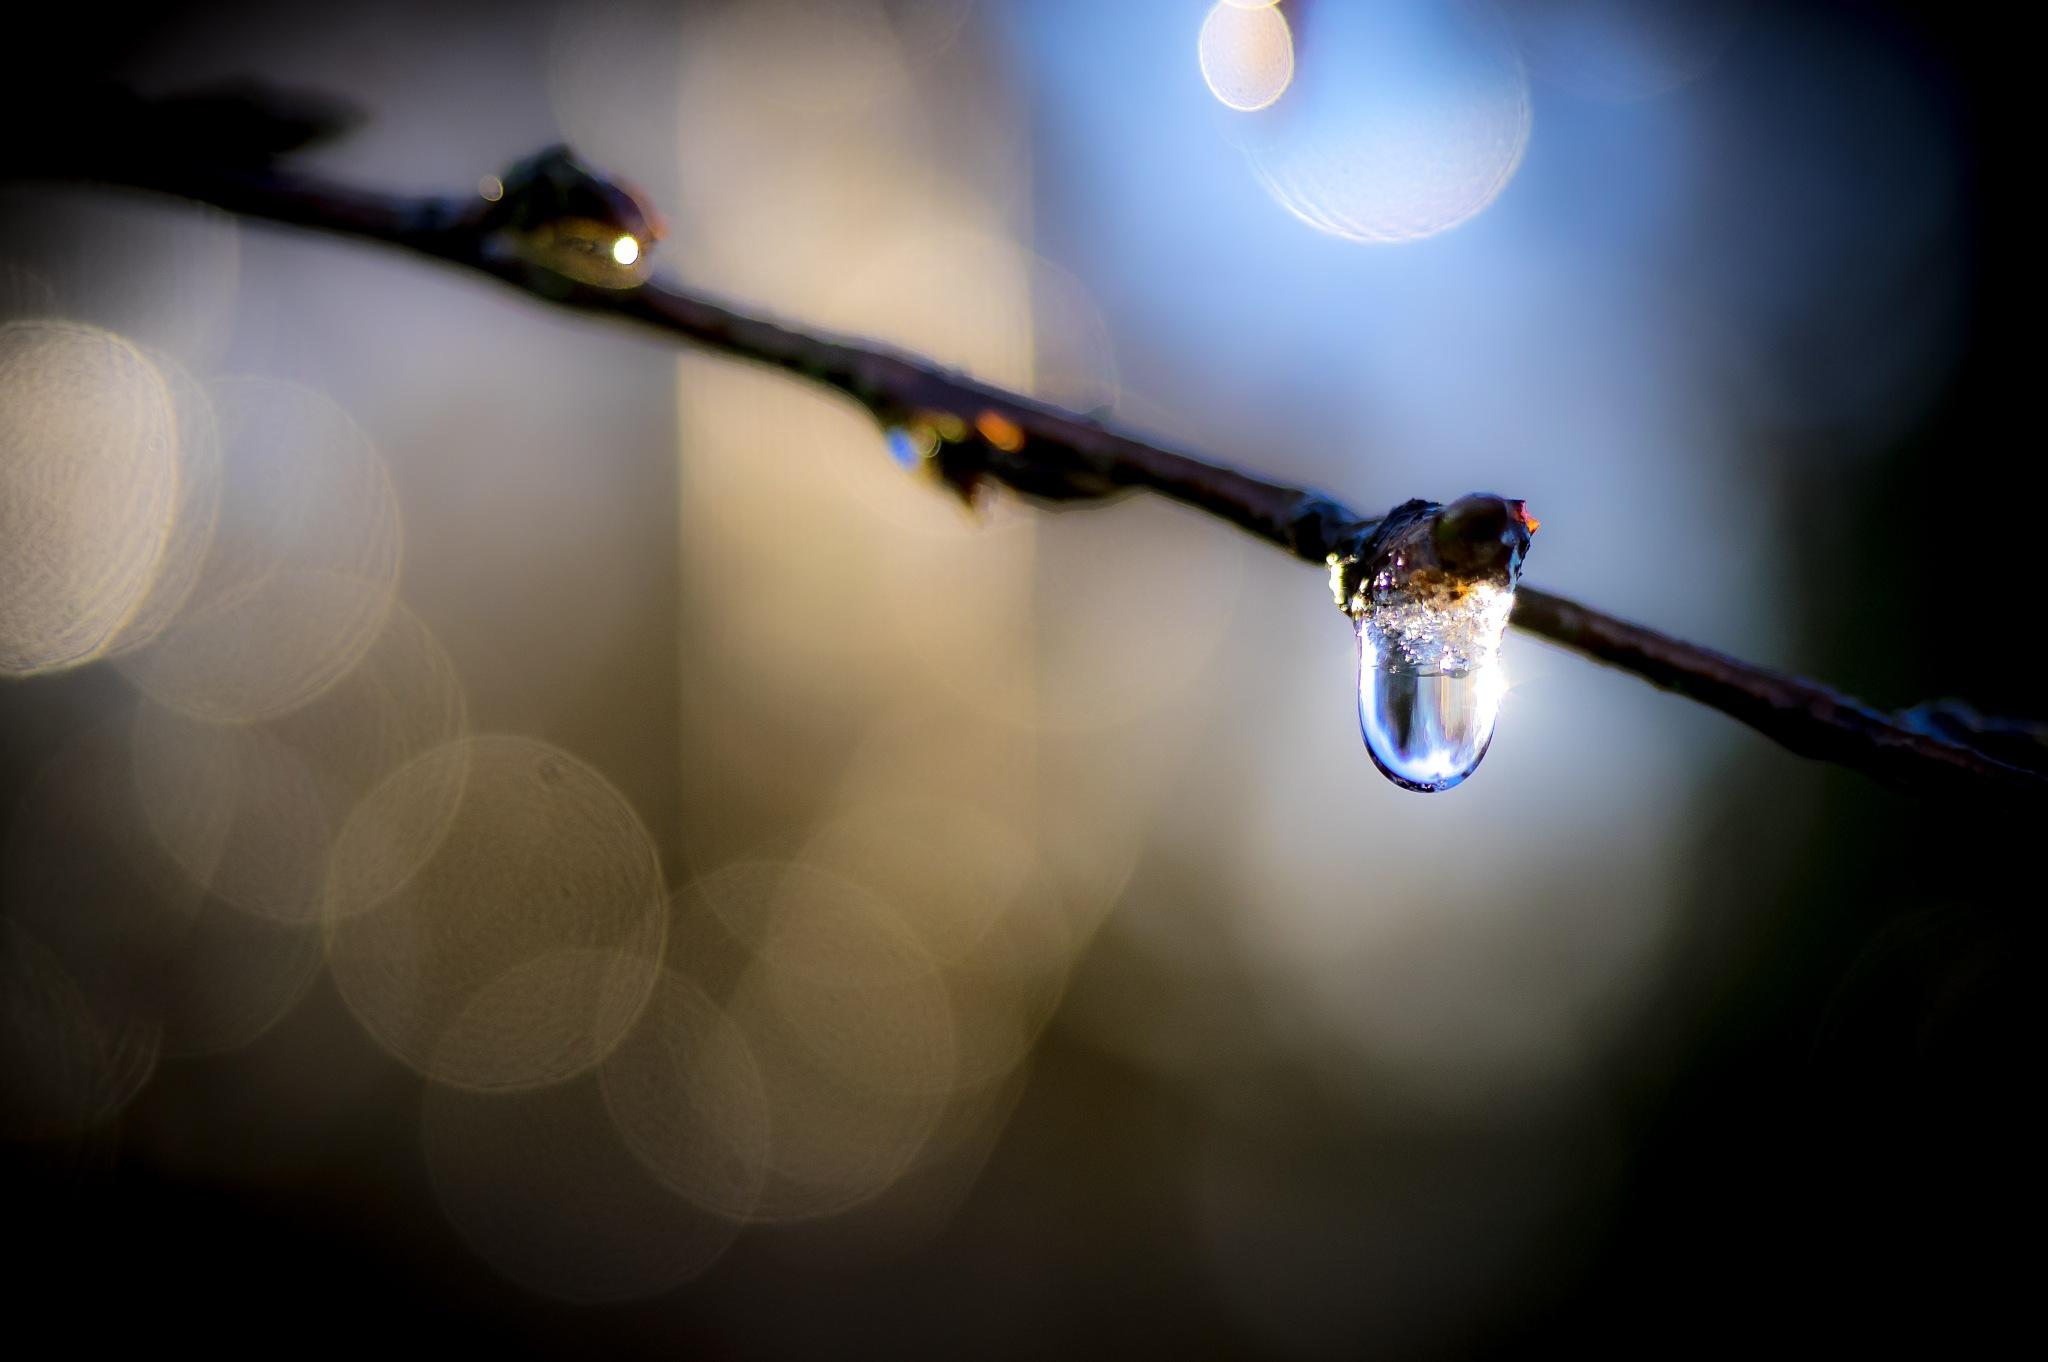 Drip Bokeh by Sarah Walters